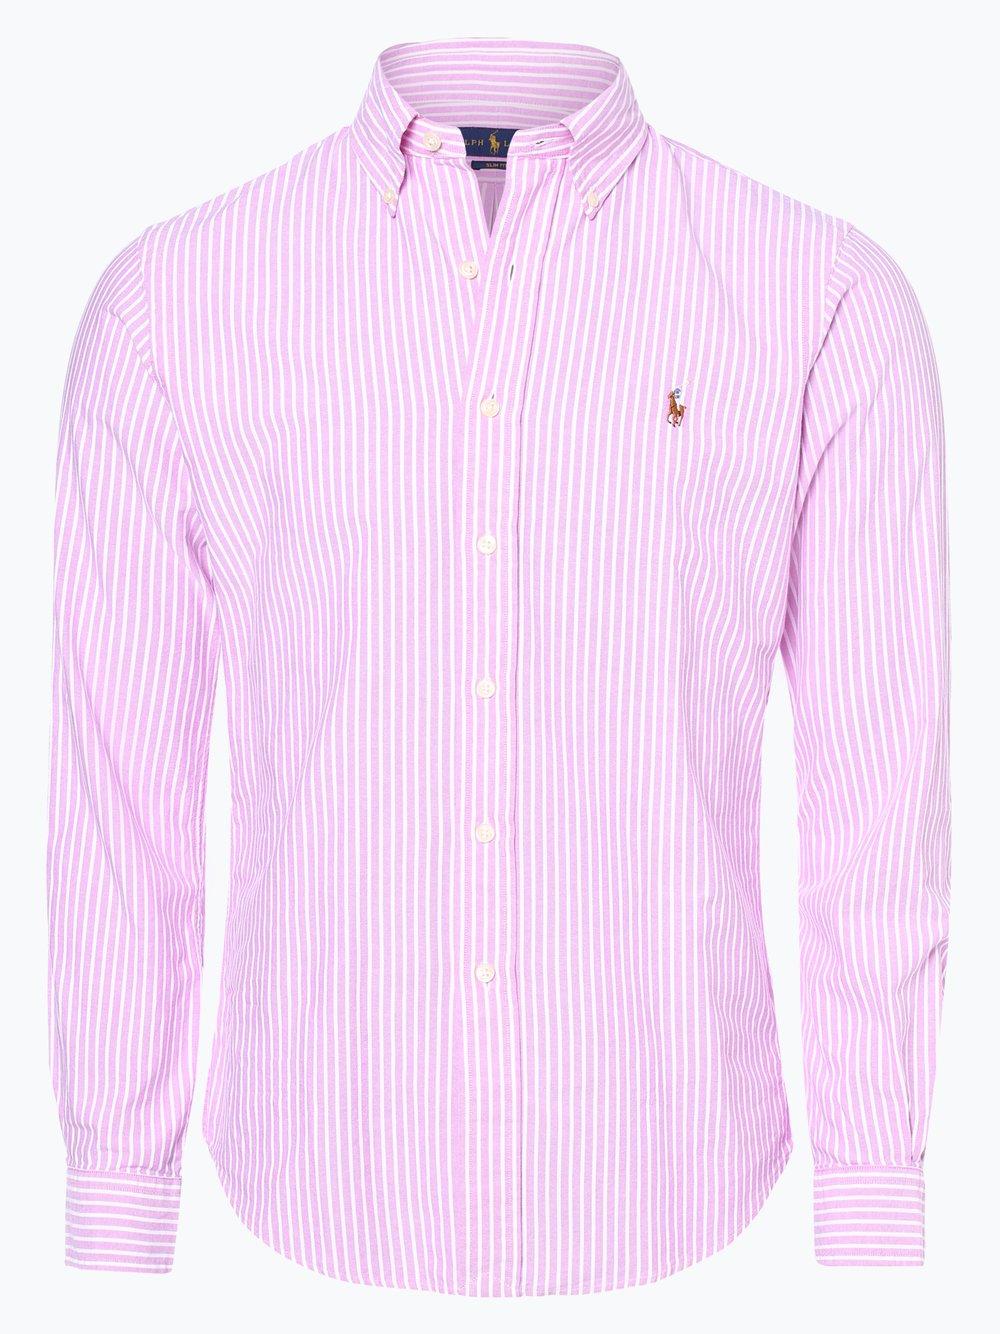 447199d5b148dd Polo Ralph Lauren Herren Hemd online kaufen